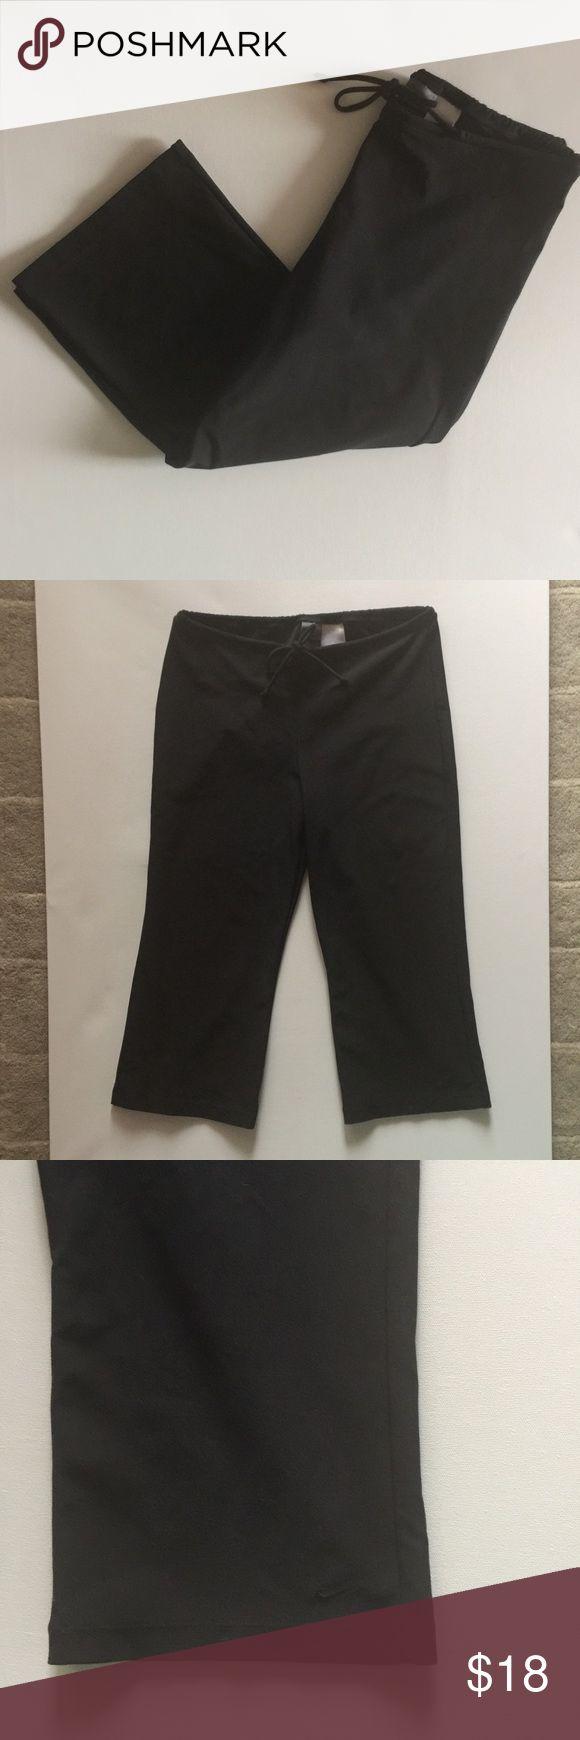 Nike black crop pants- size medium Nike black crop pants - size medium. Lighting is poor and casting shadows - not fading. Drawstring waist. Nike Pants Track Pants & Joggers